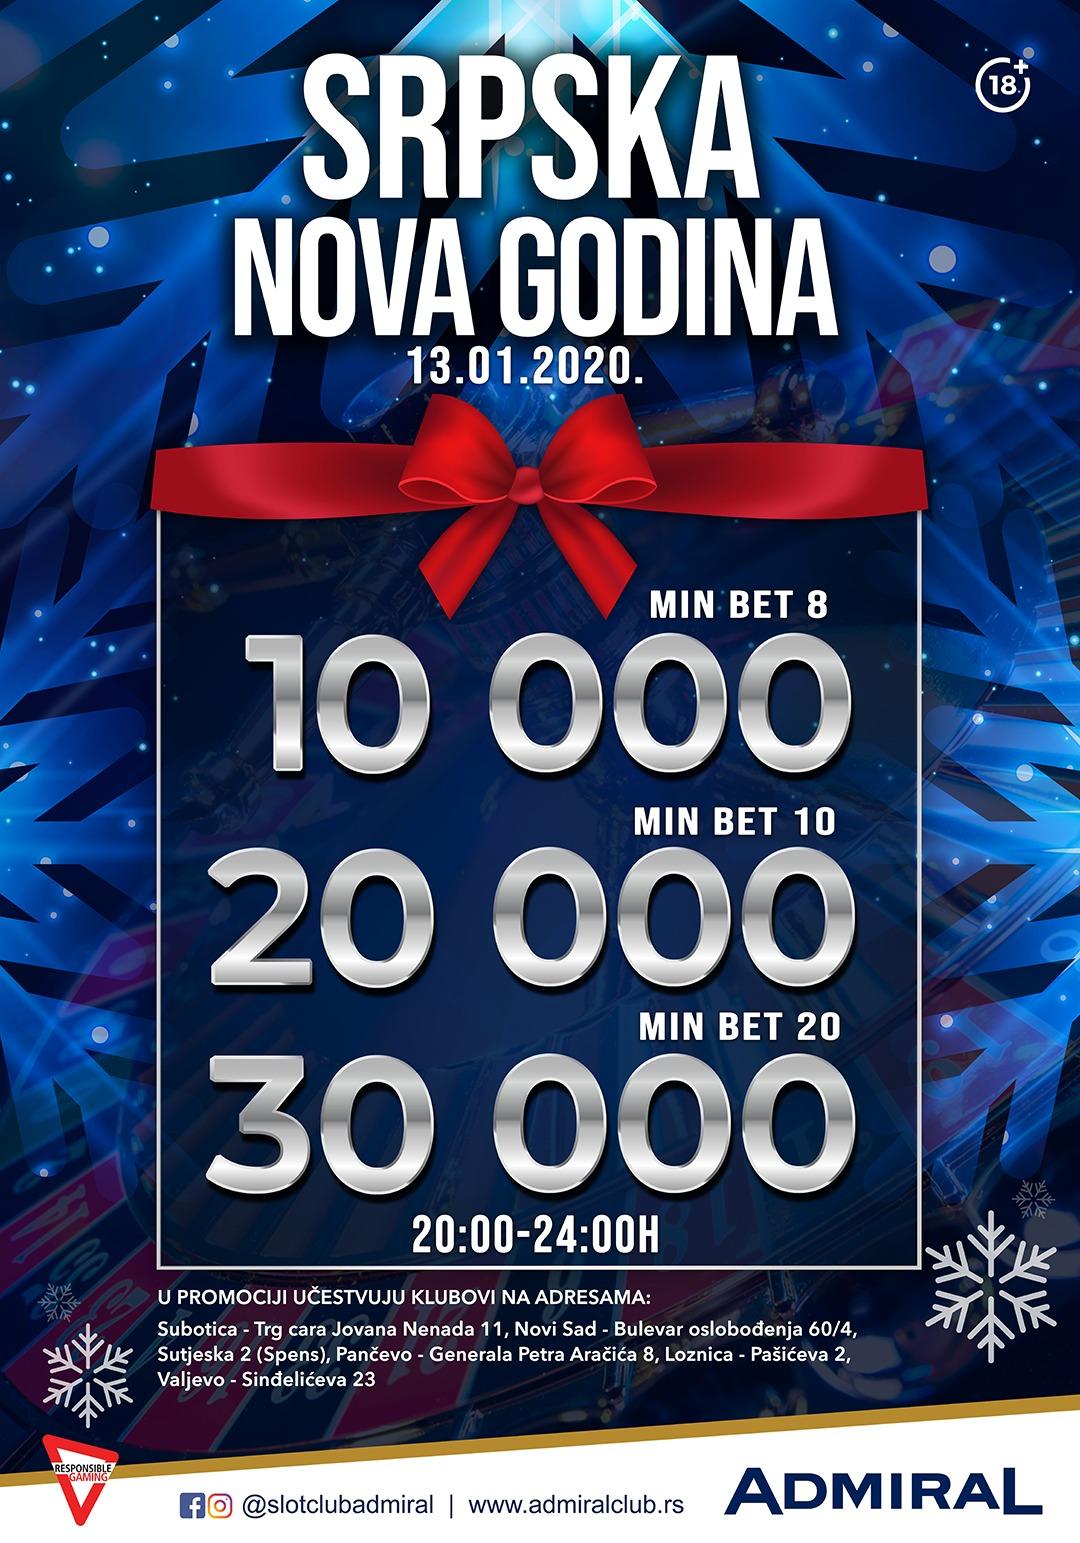 Srpska nova godina 3 – ns bulevar oslobodjenja EN